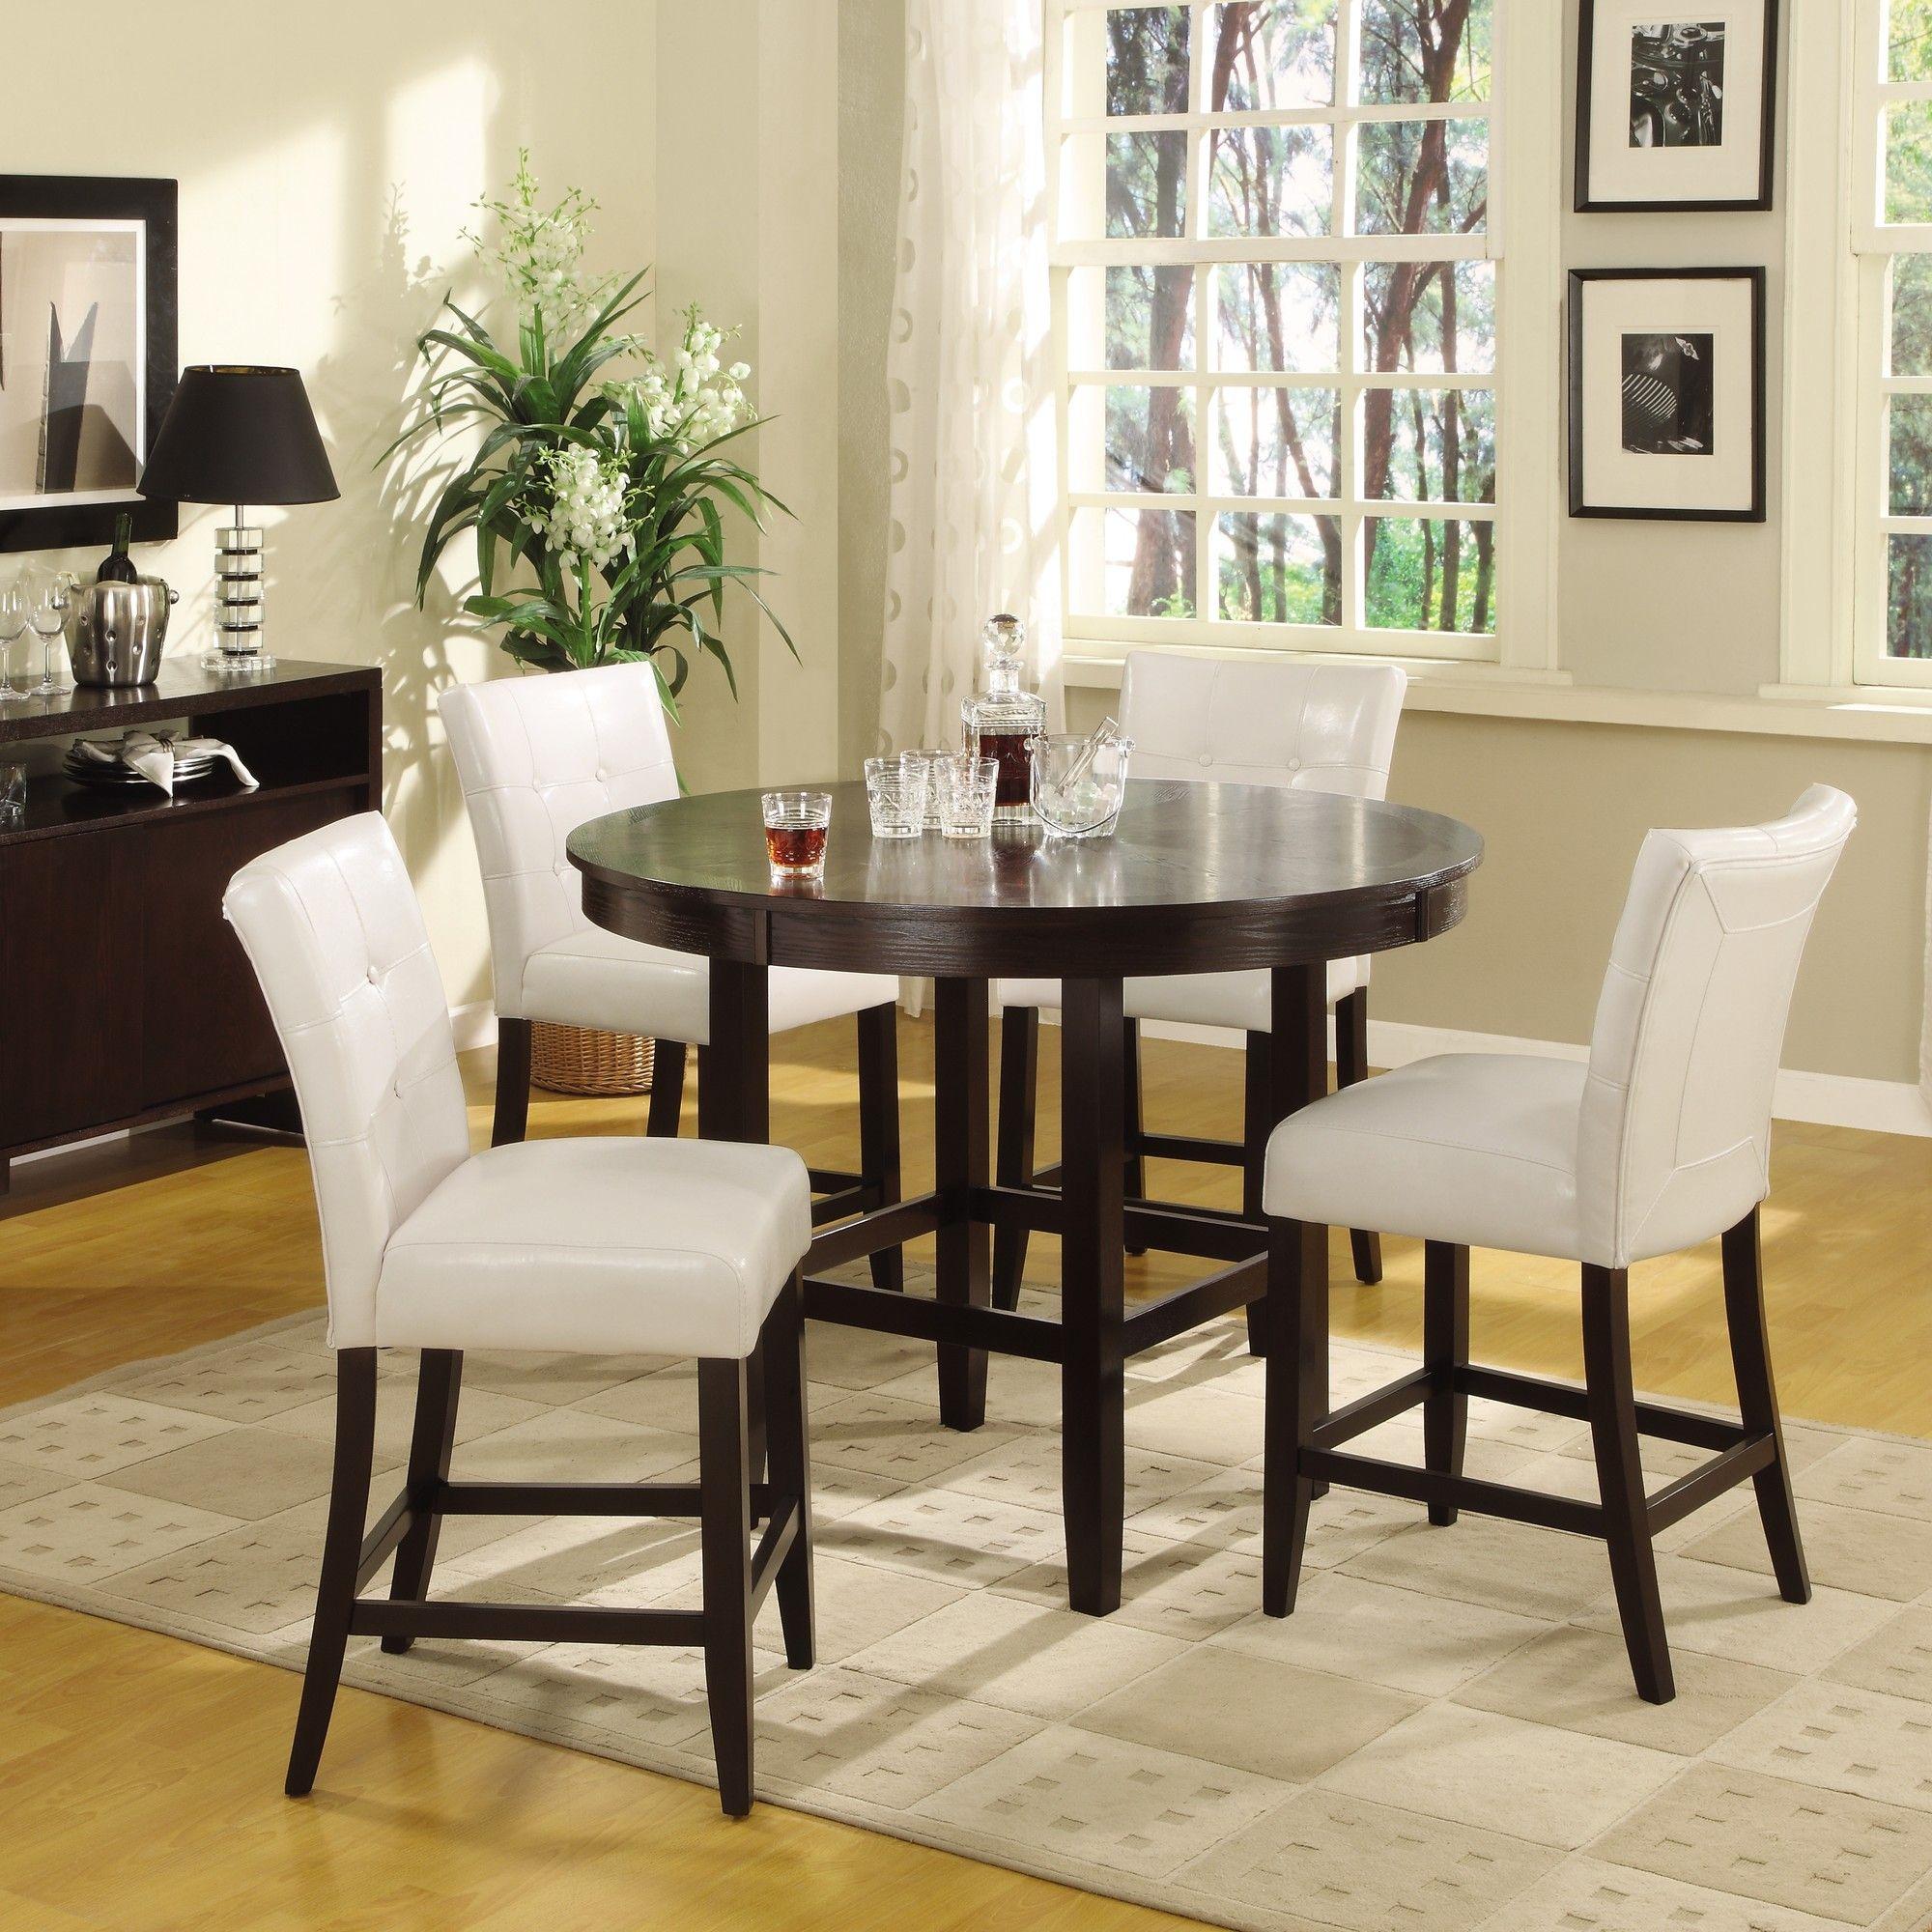 Bossa 5 Piece Counter Height Dining Set | Wayfair | Dining room sets ...